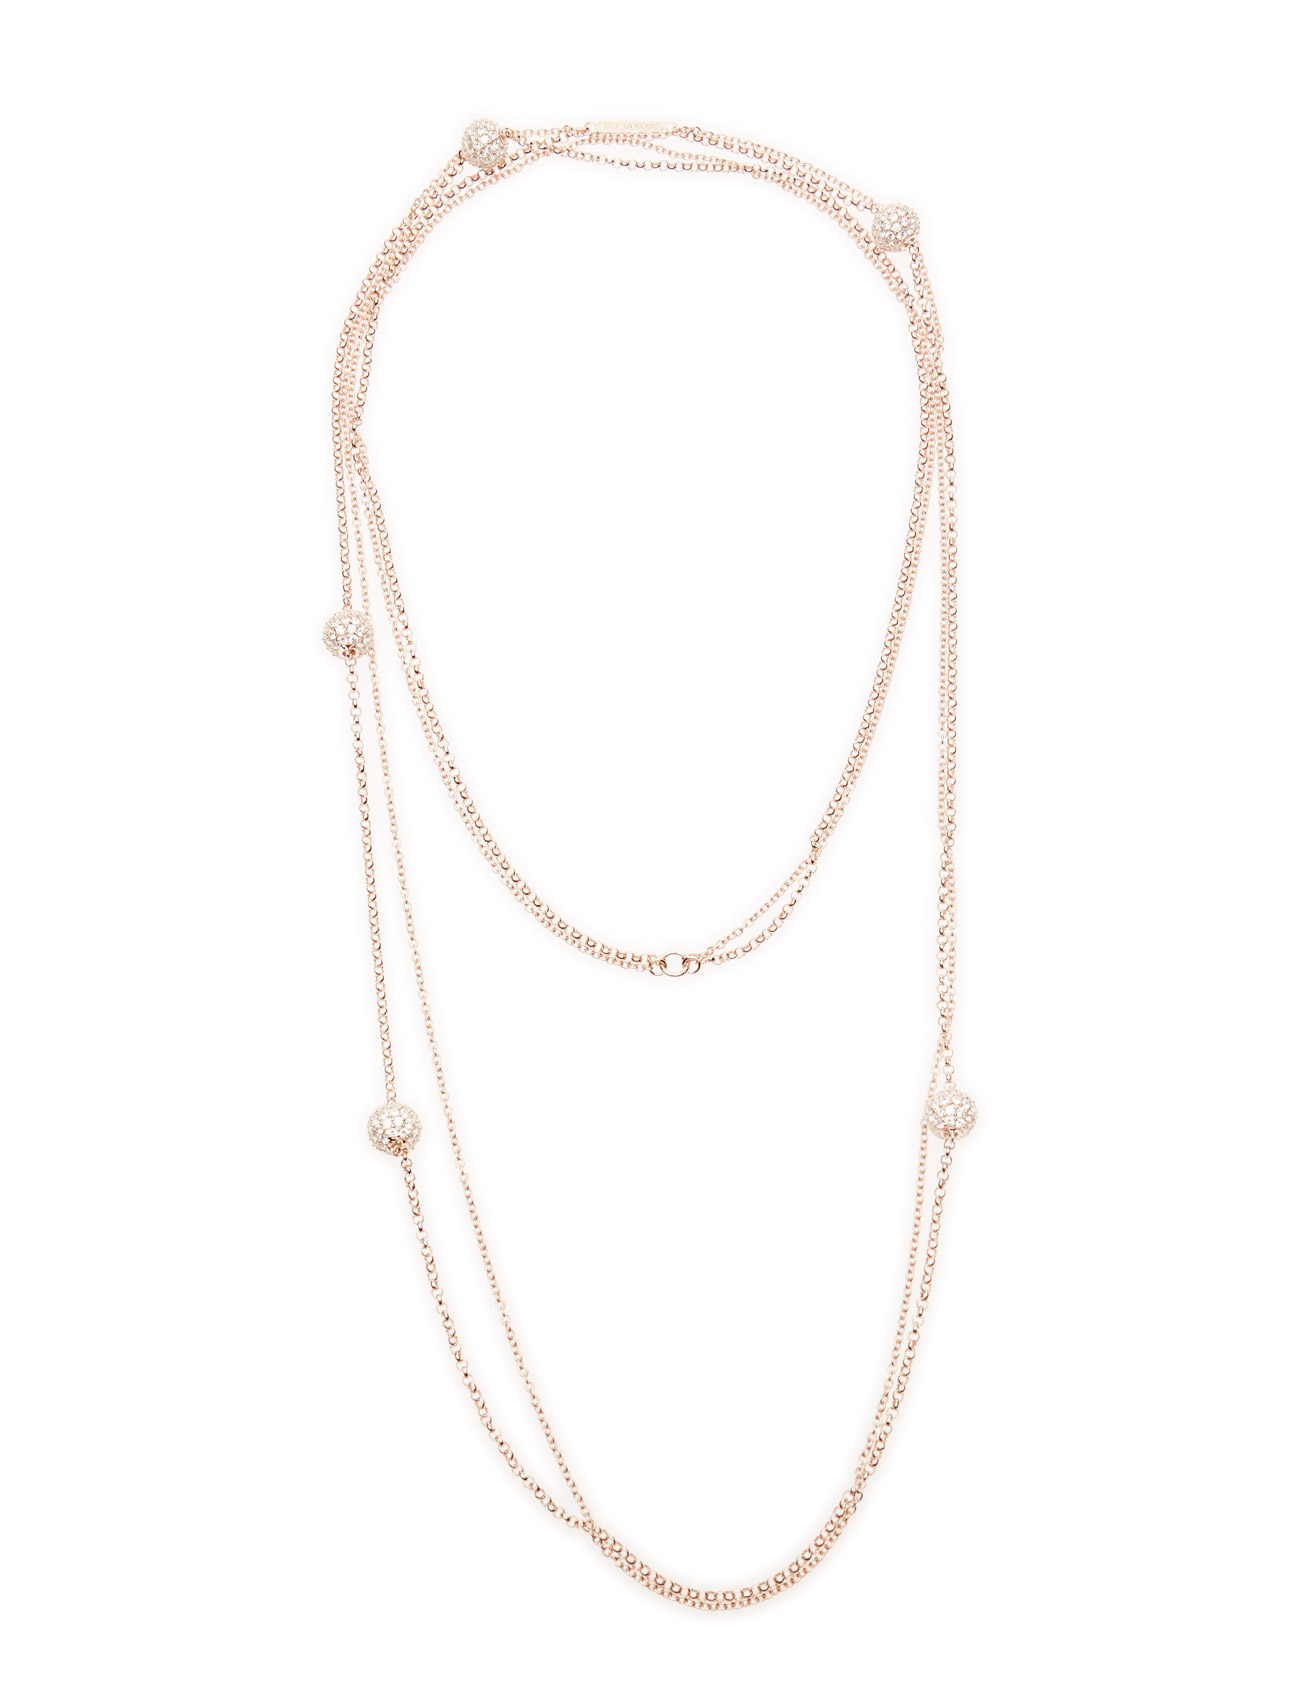 Comacchio Necklace Sif Jakobs Jewellery Smykker til Kvinder i Guld